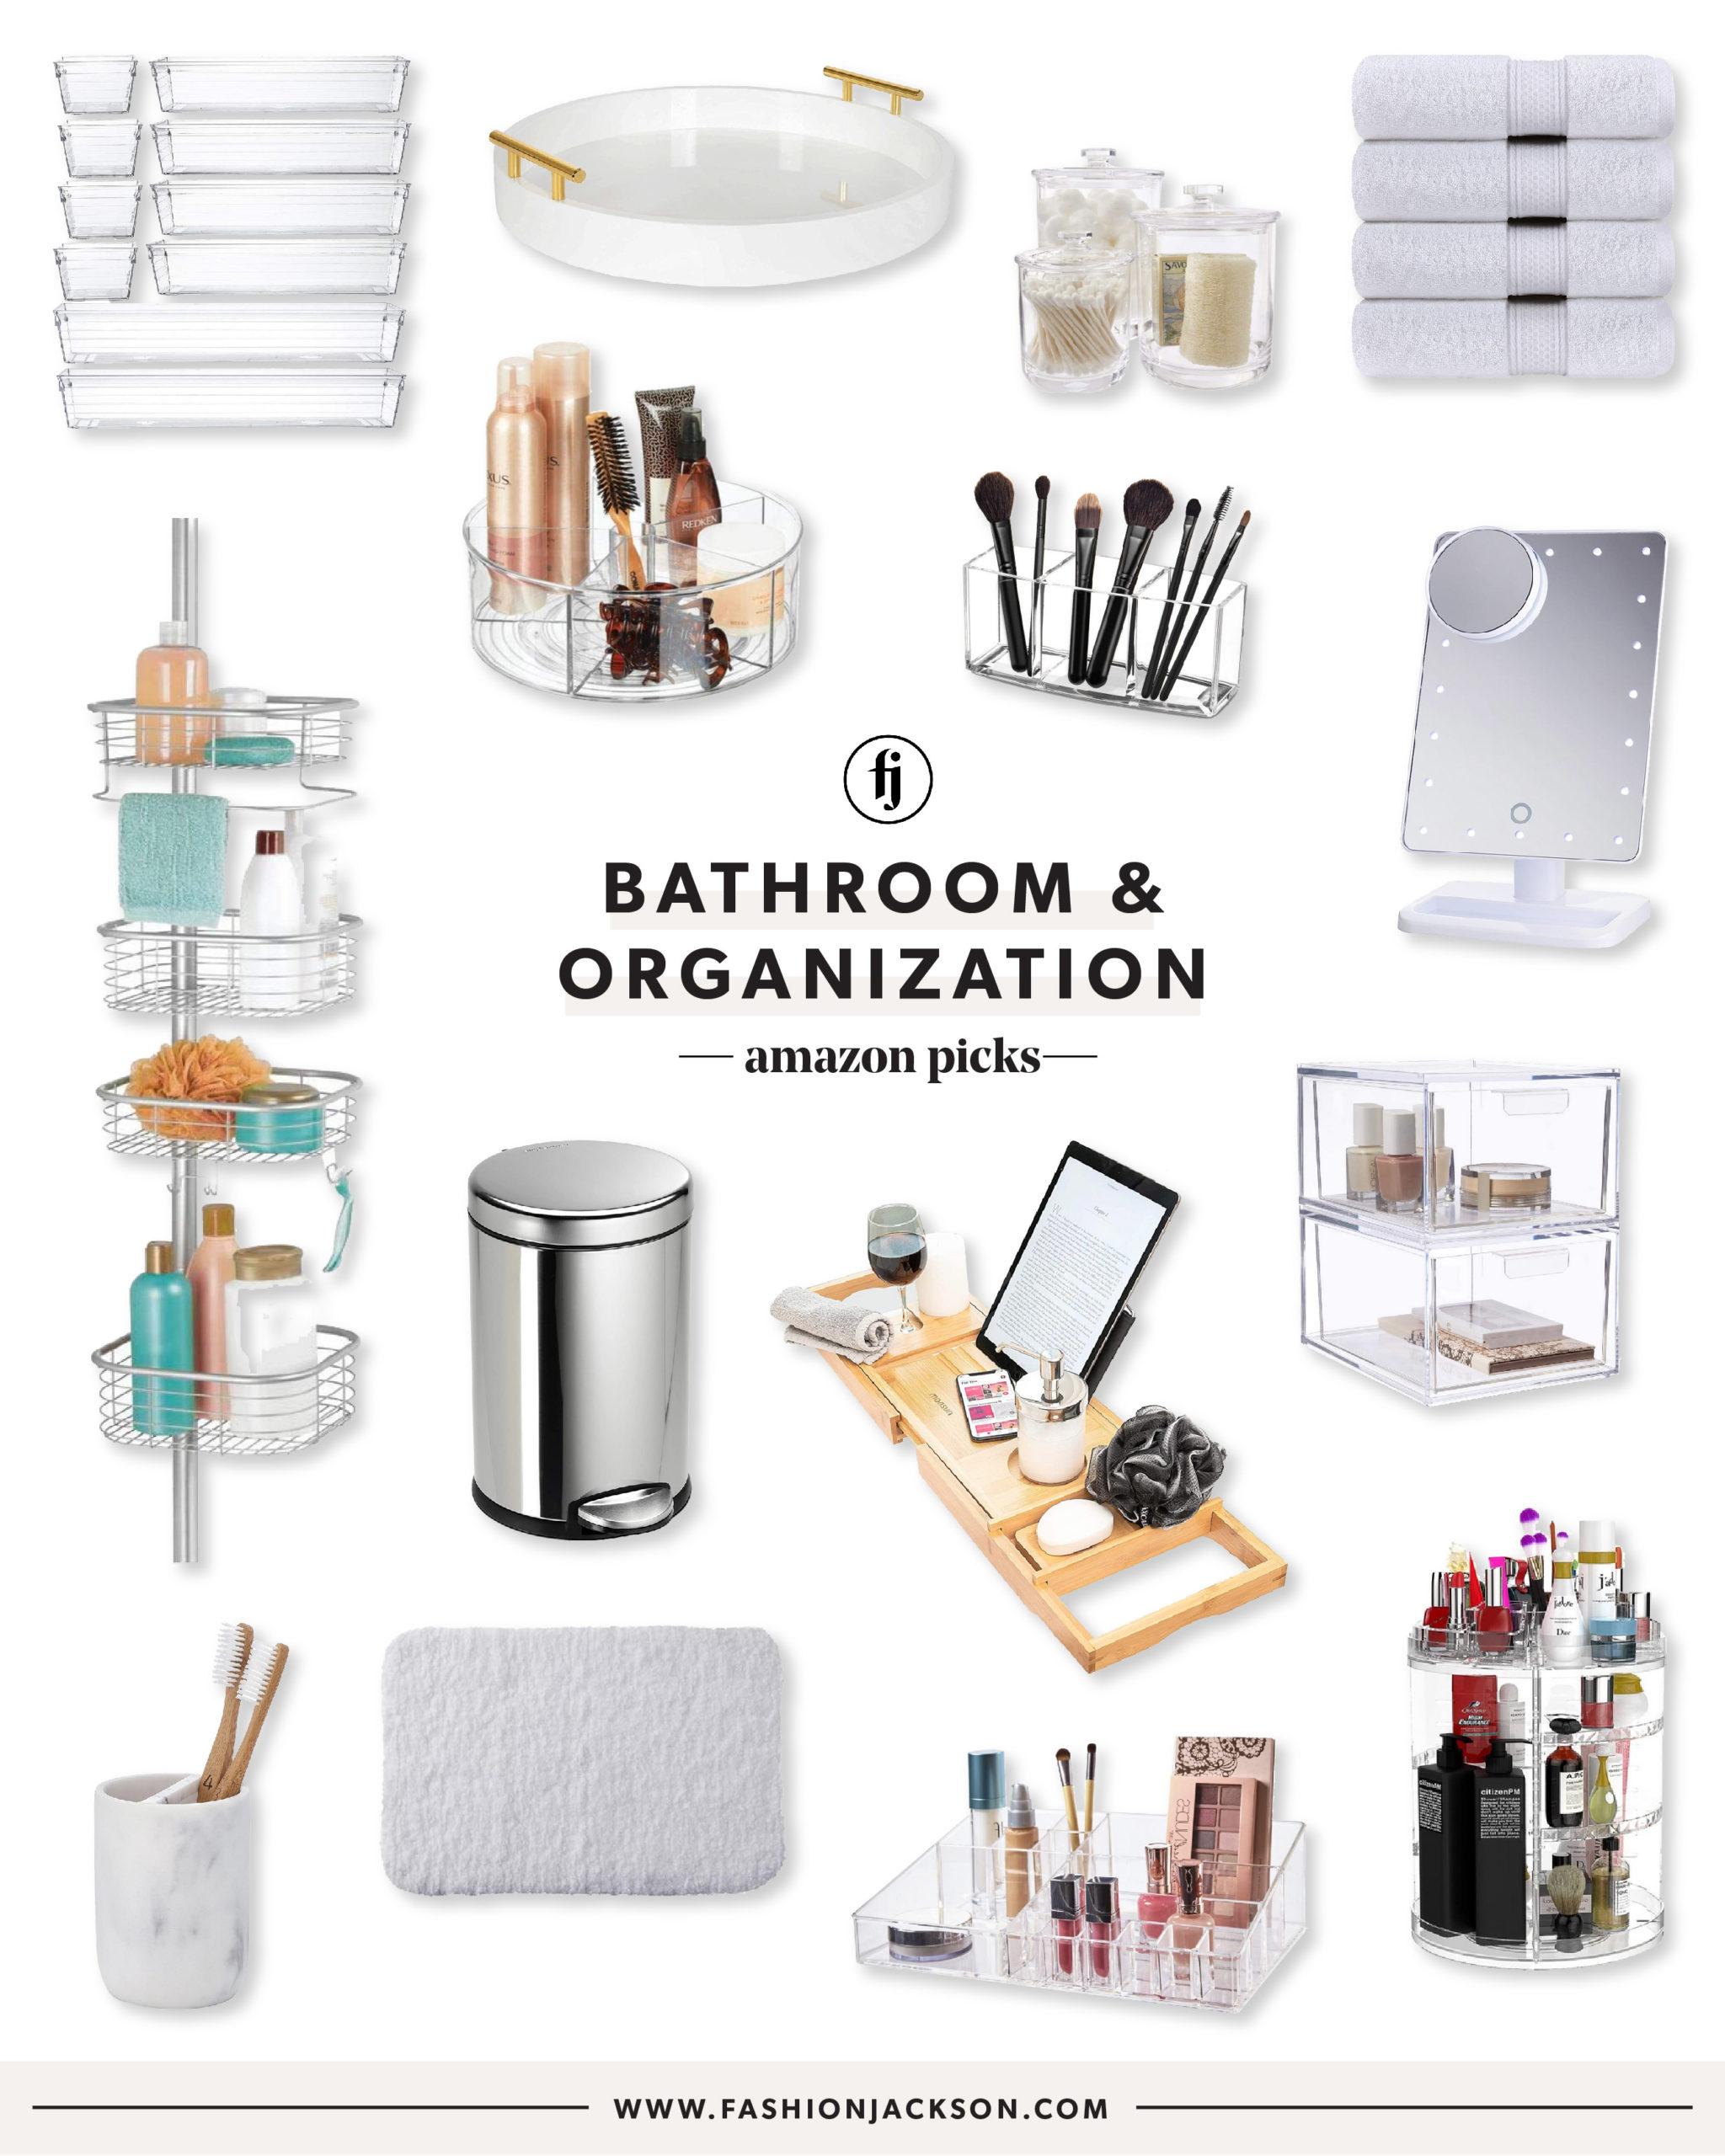 Amazon Bathroom & Organization